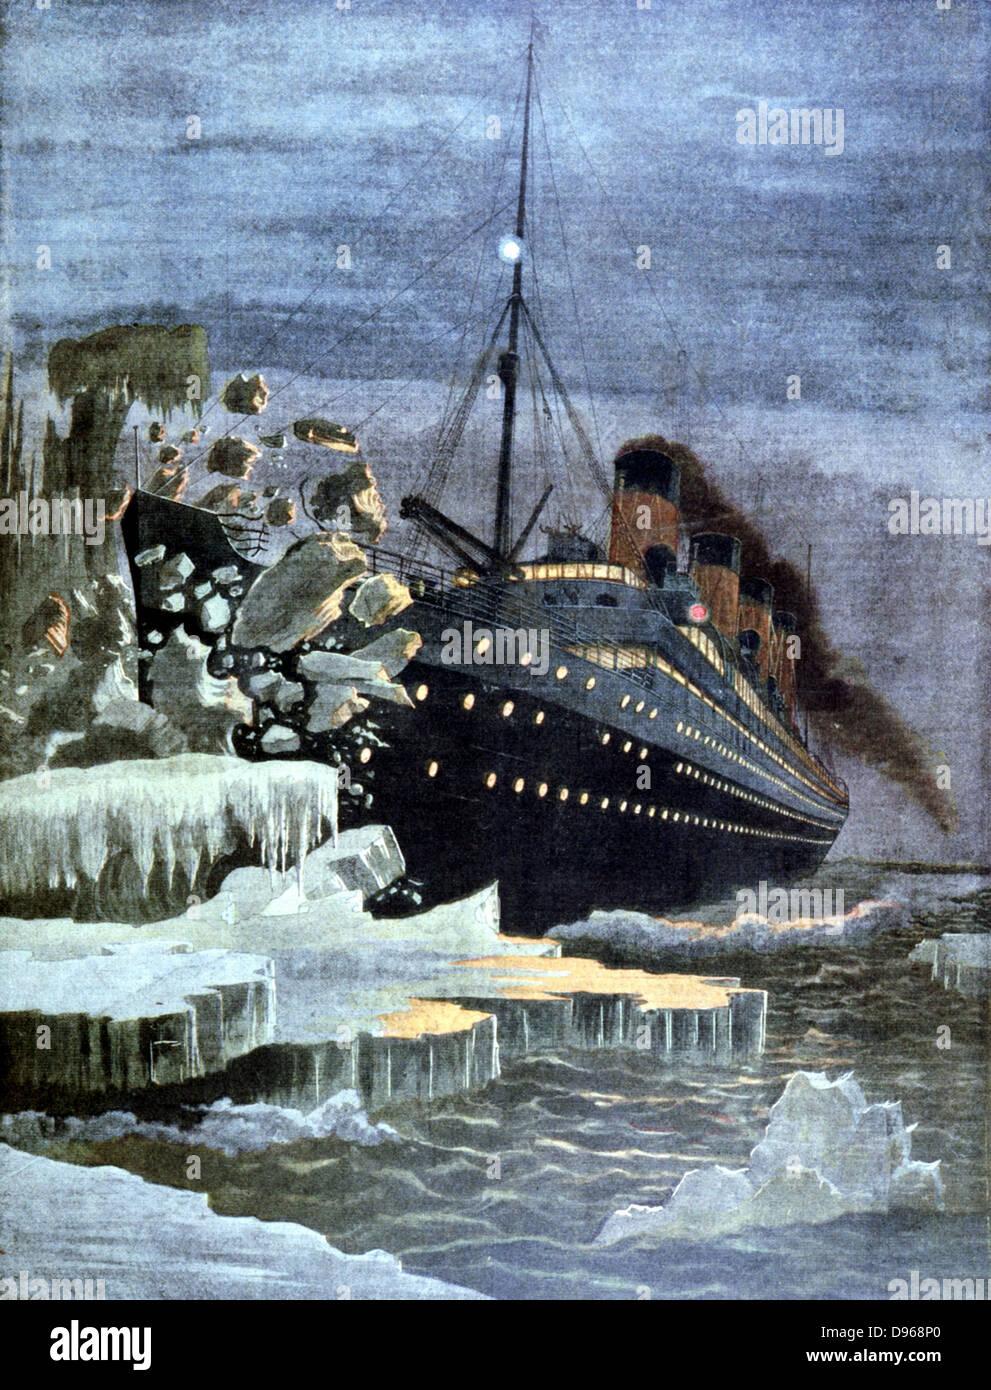 SS Titanic colliding with an iceberg 14 April 1912. From 'Le Petit Journal' Paris 28 April 1912 - Stock Image